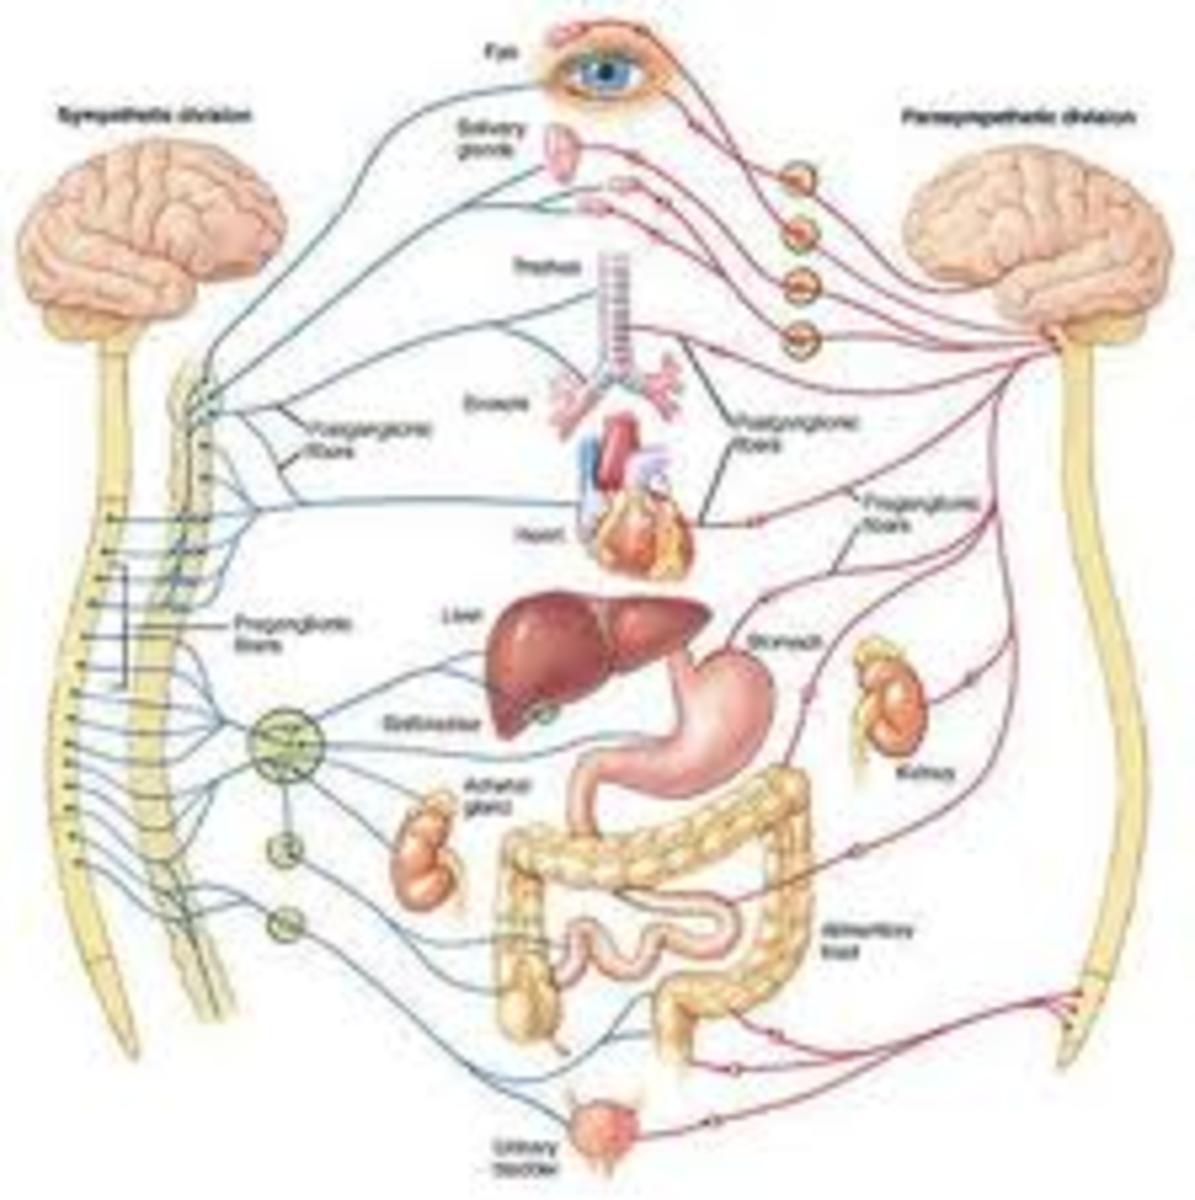 Network of nerves